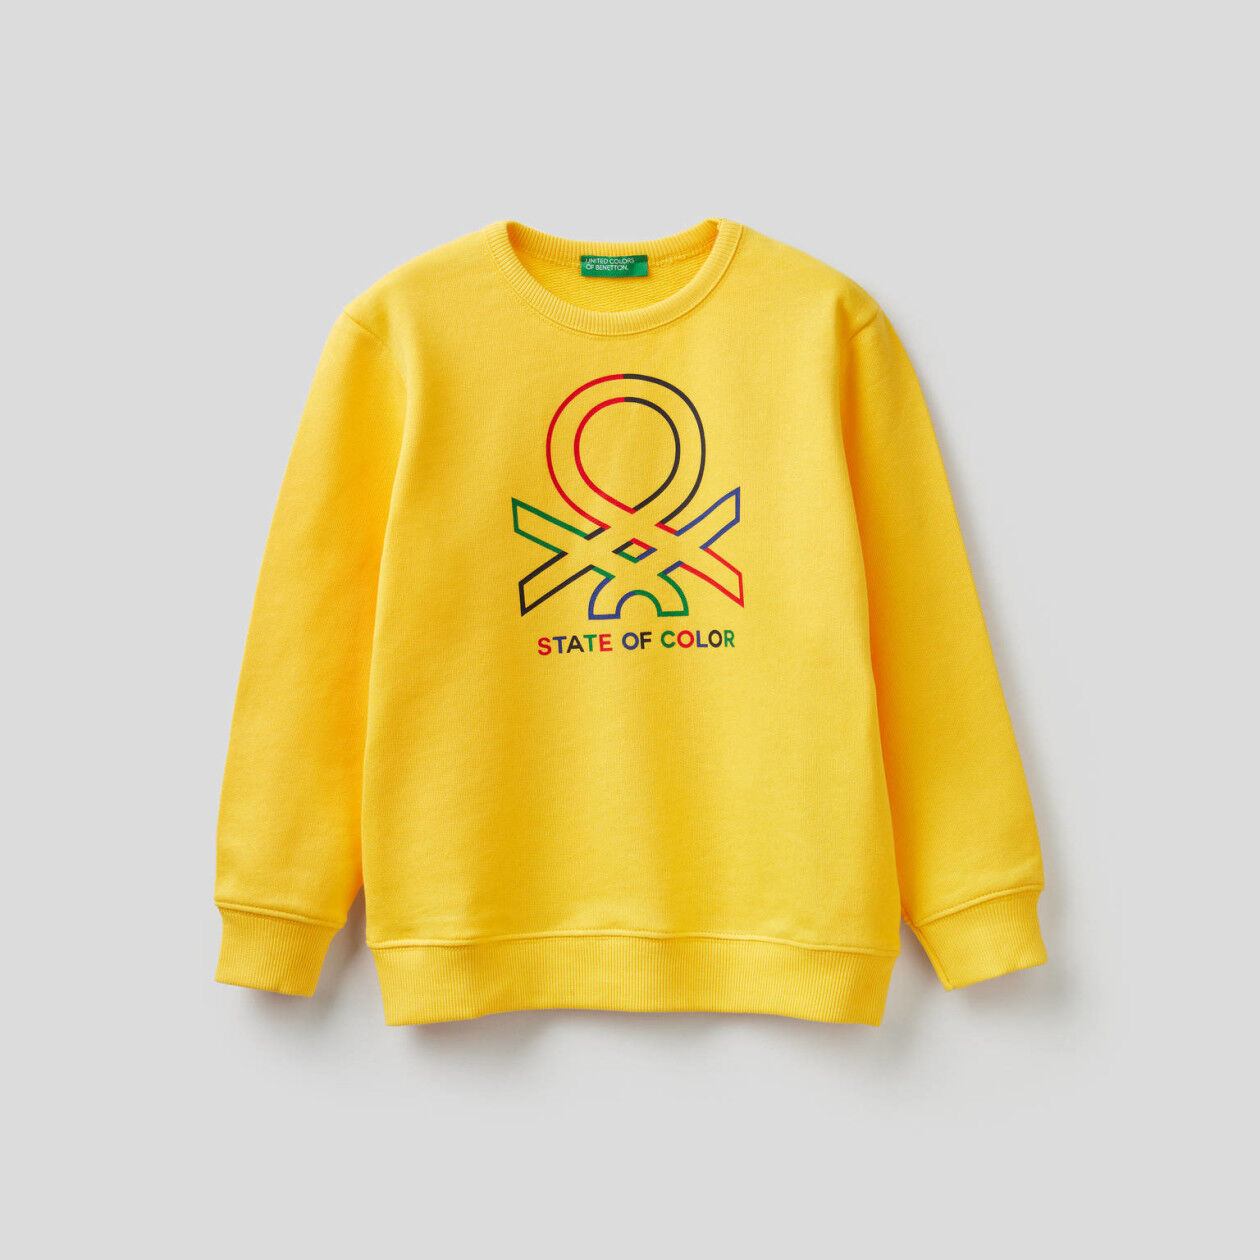 United Colors of Benetton Gonna Salopette Peto Bebe para Beb/és